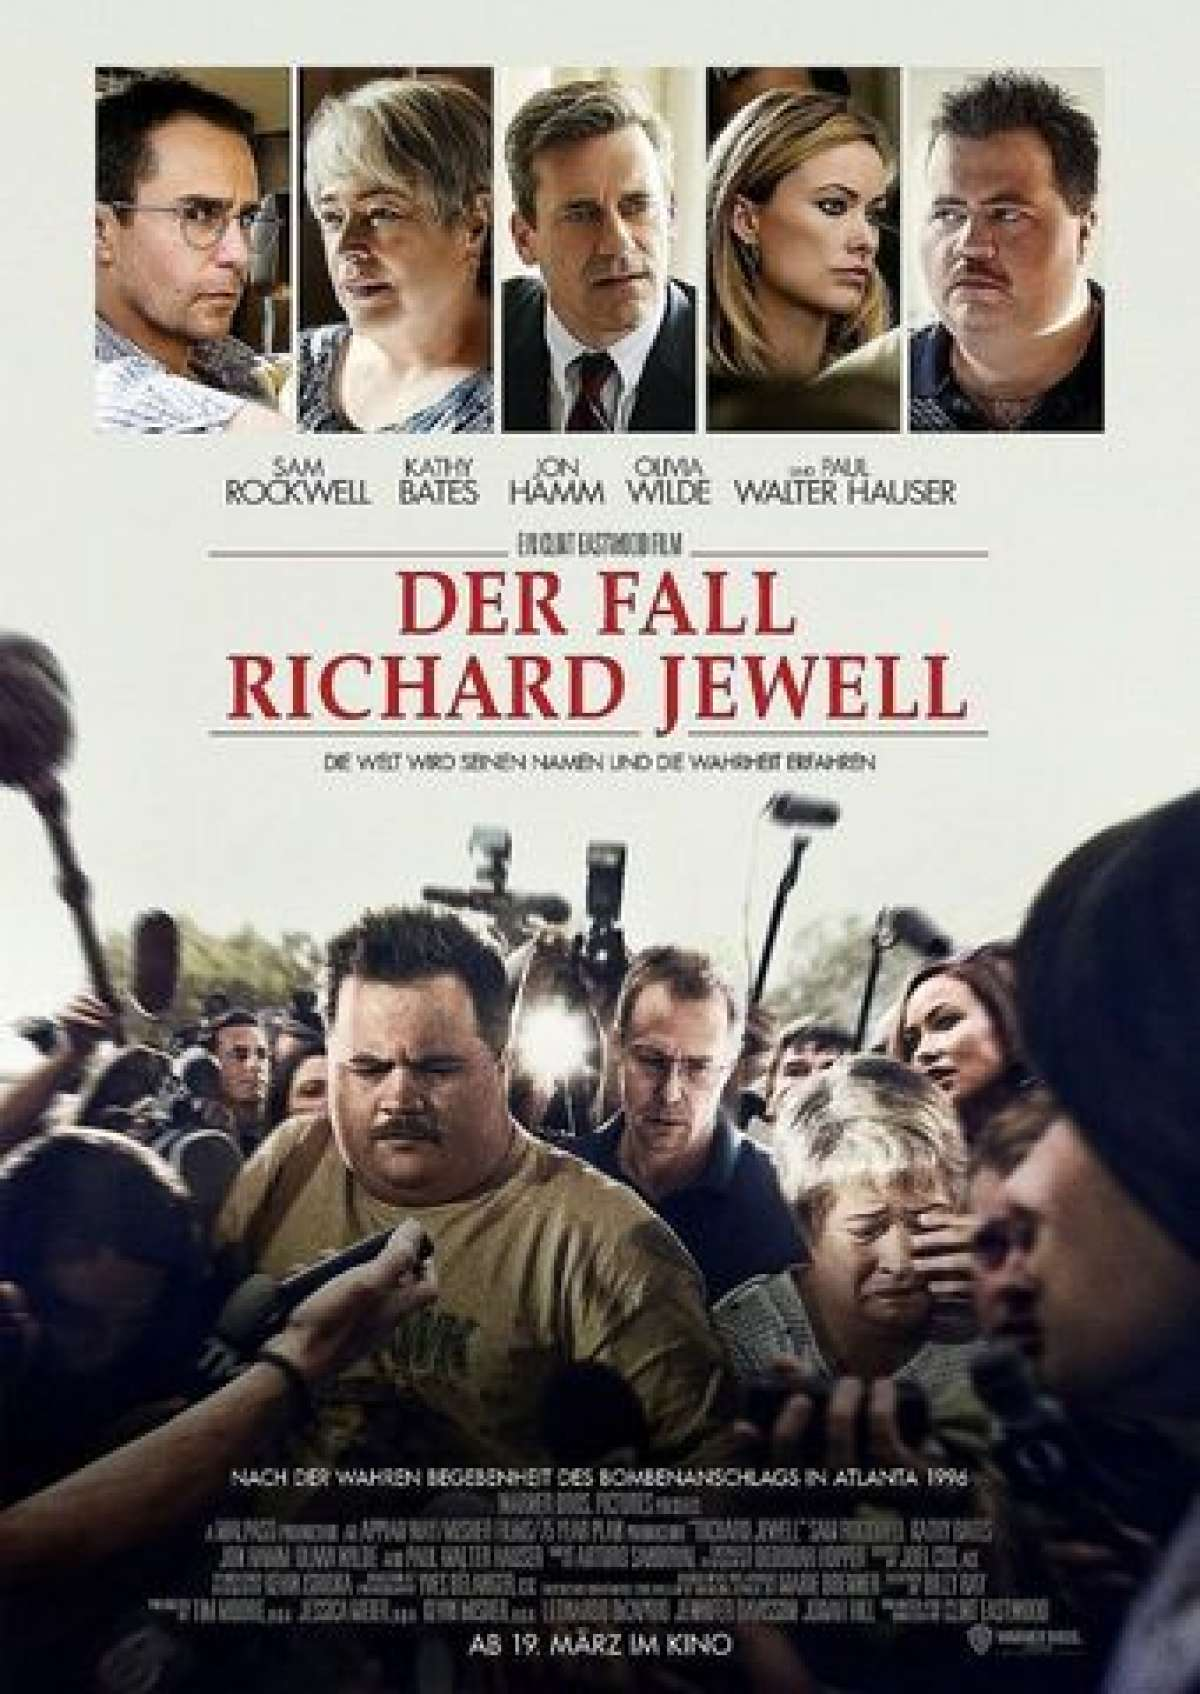 Der Fall Richard Jewell - Cineplex  - Lippstadt